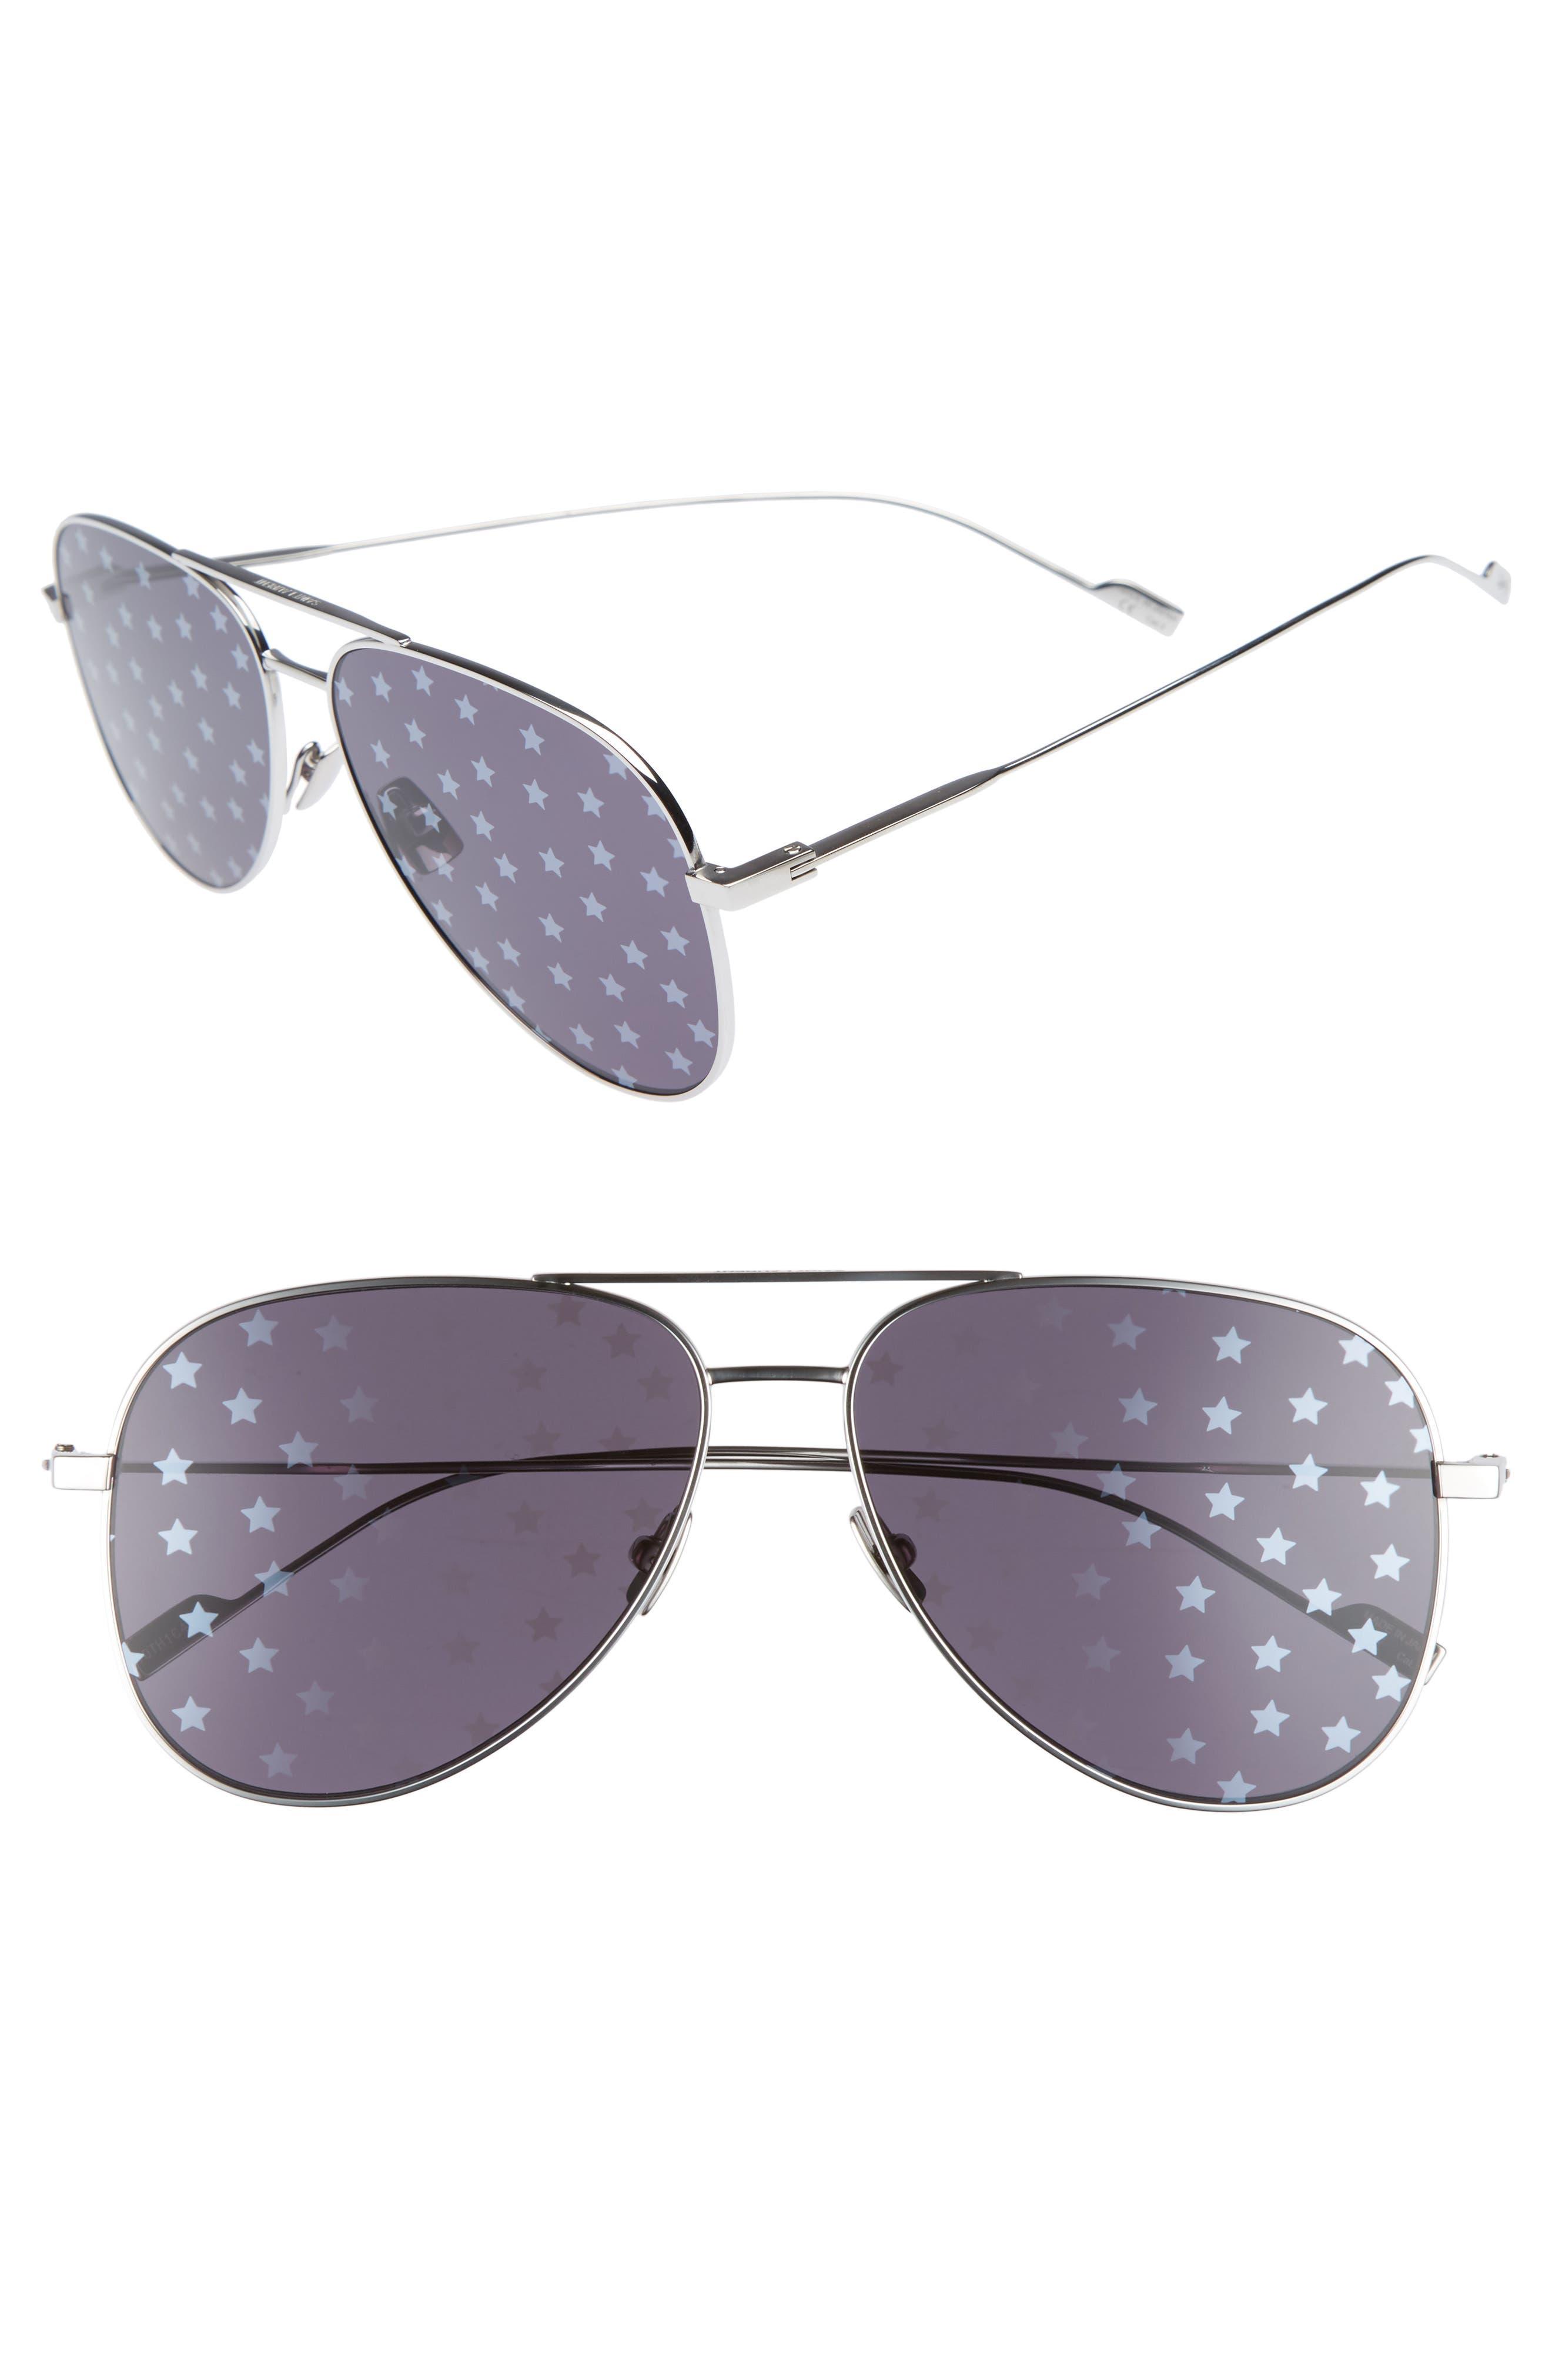 Saint Laurent SL193 59mm Aviator Sunglasses